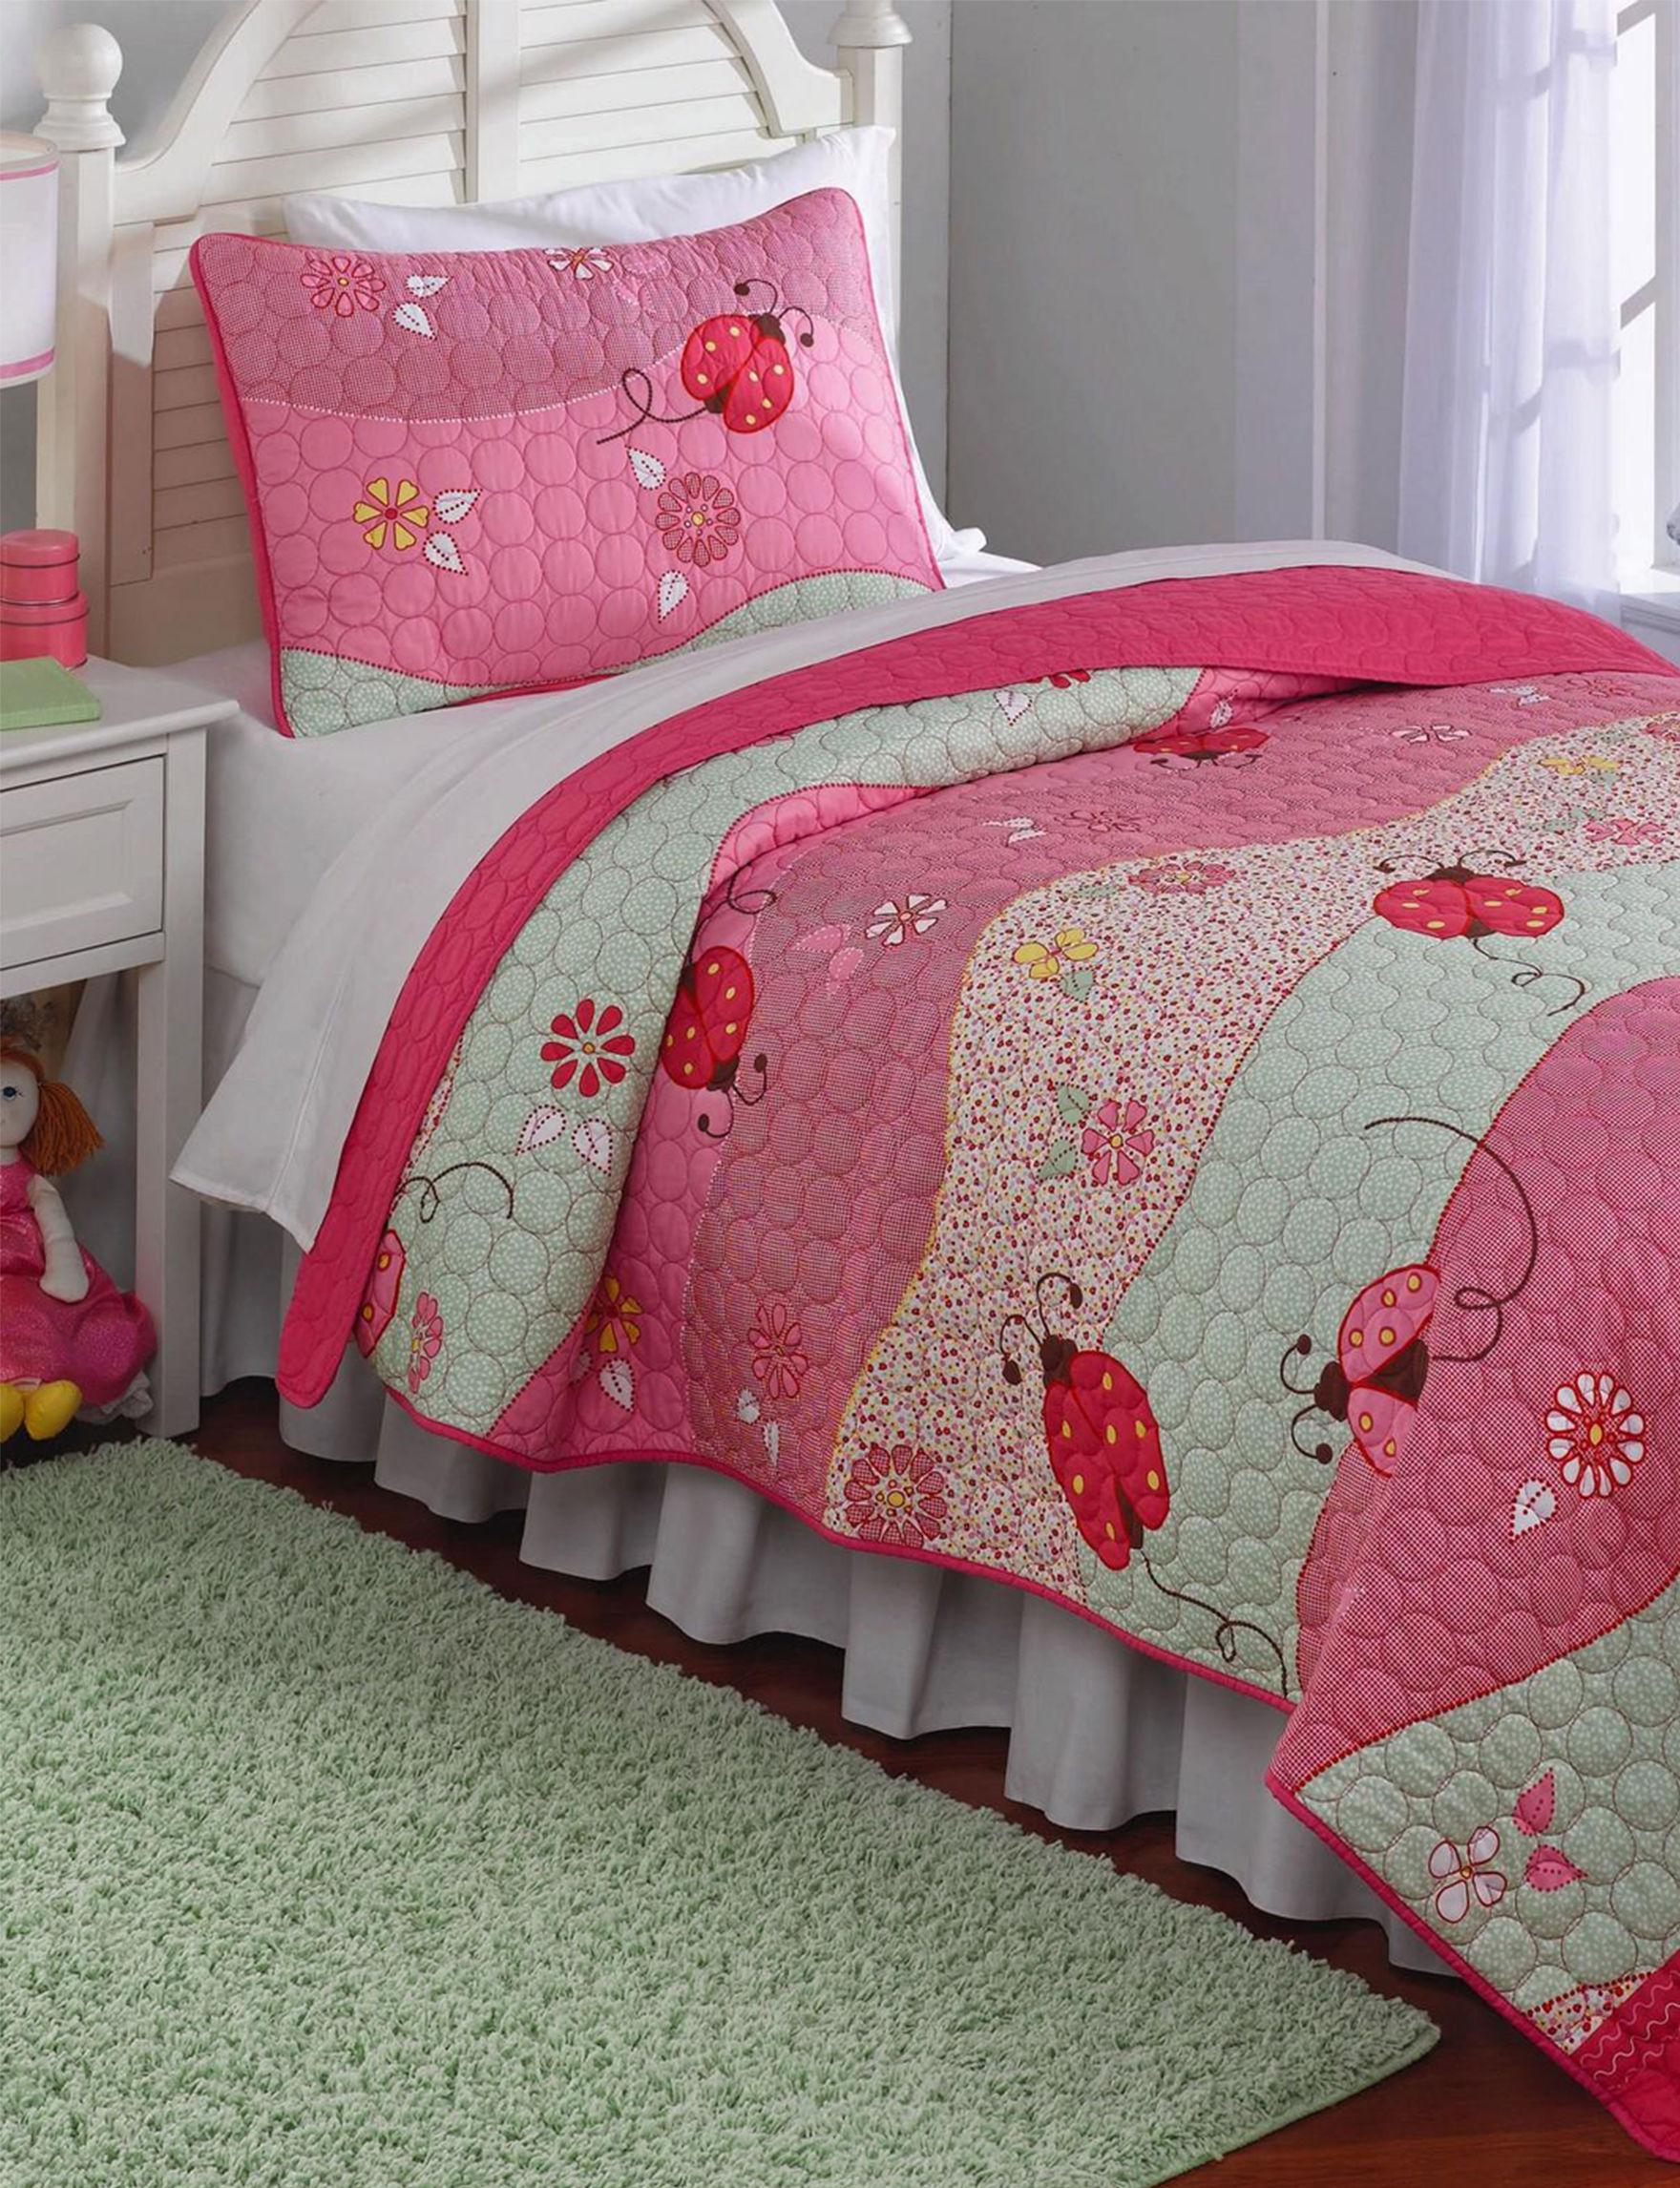 Laura Hart Pink Quilts & Quilt Sets